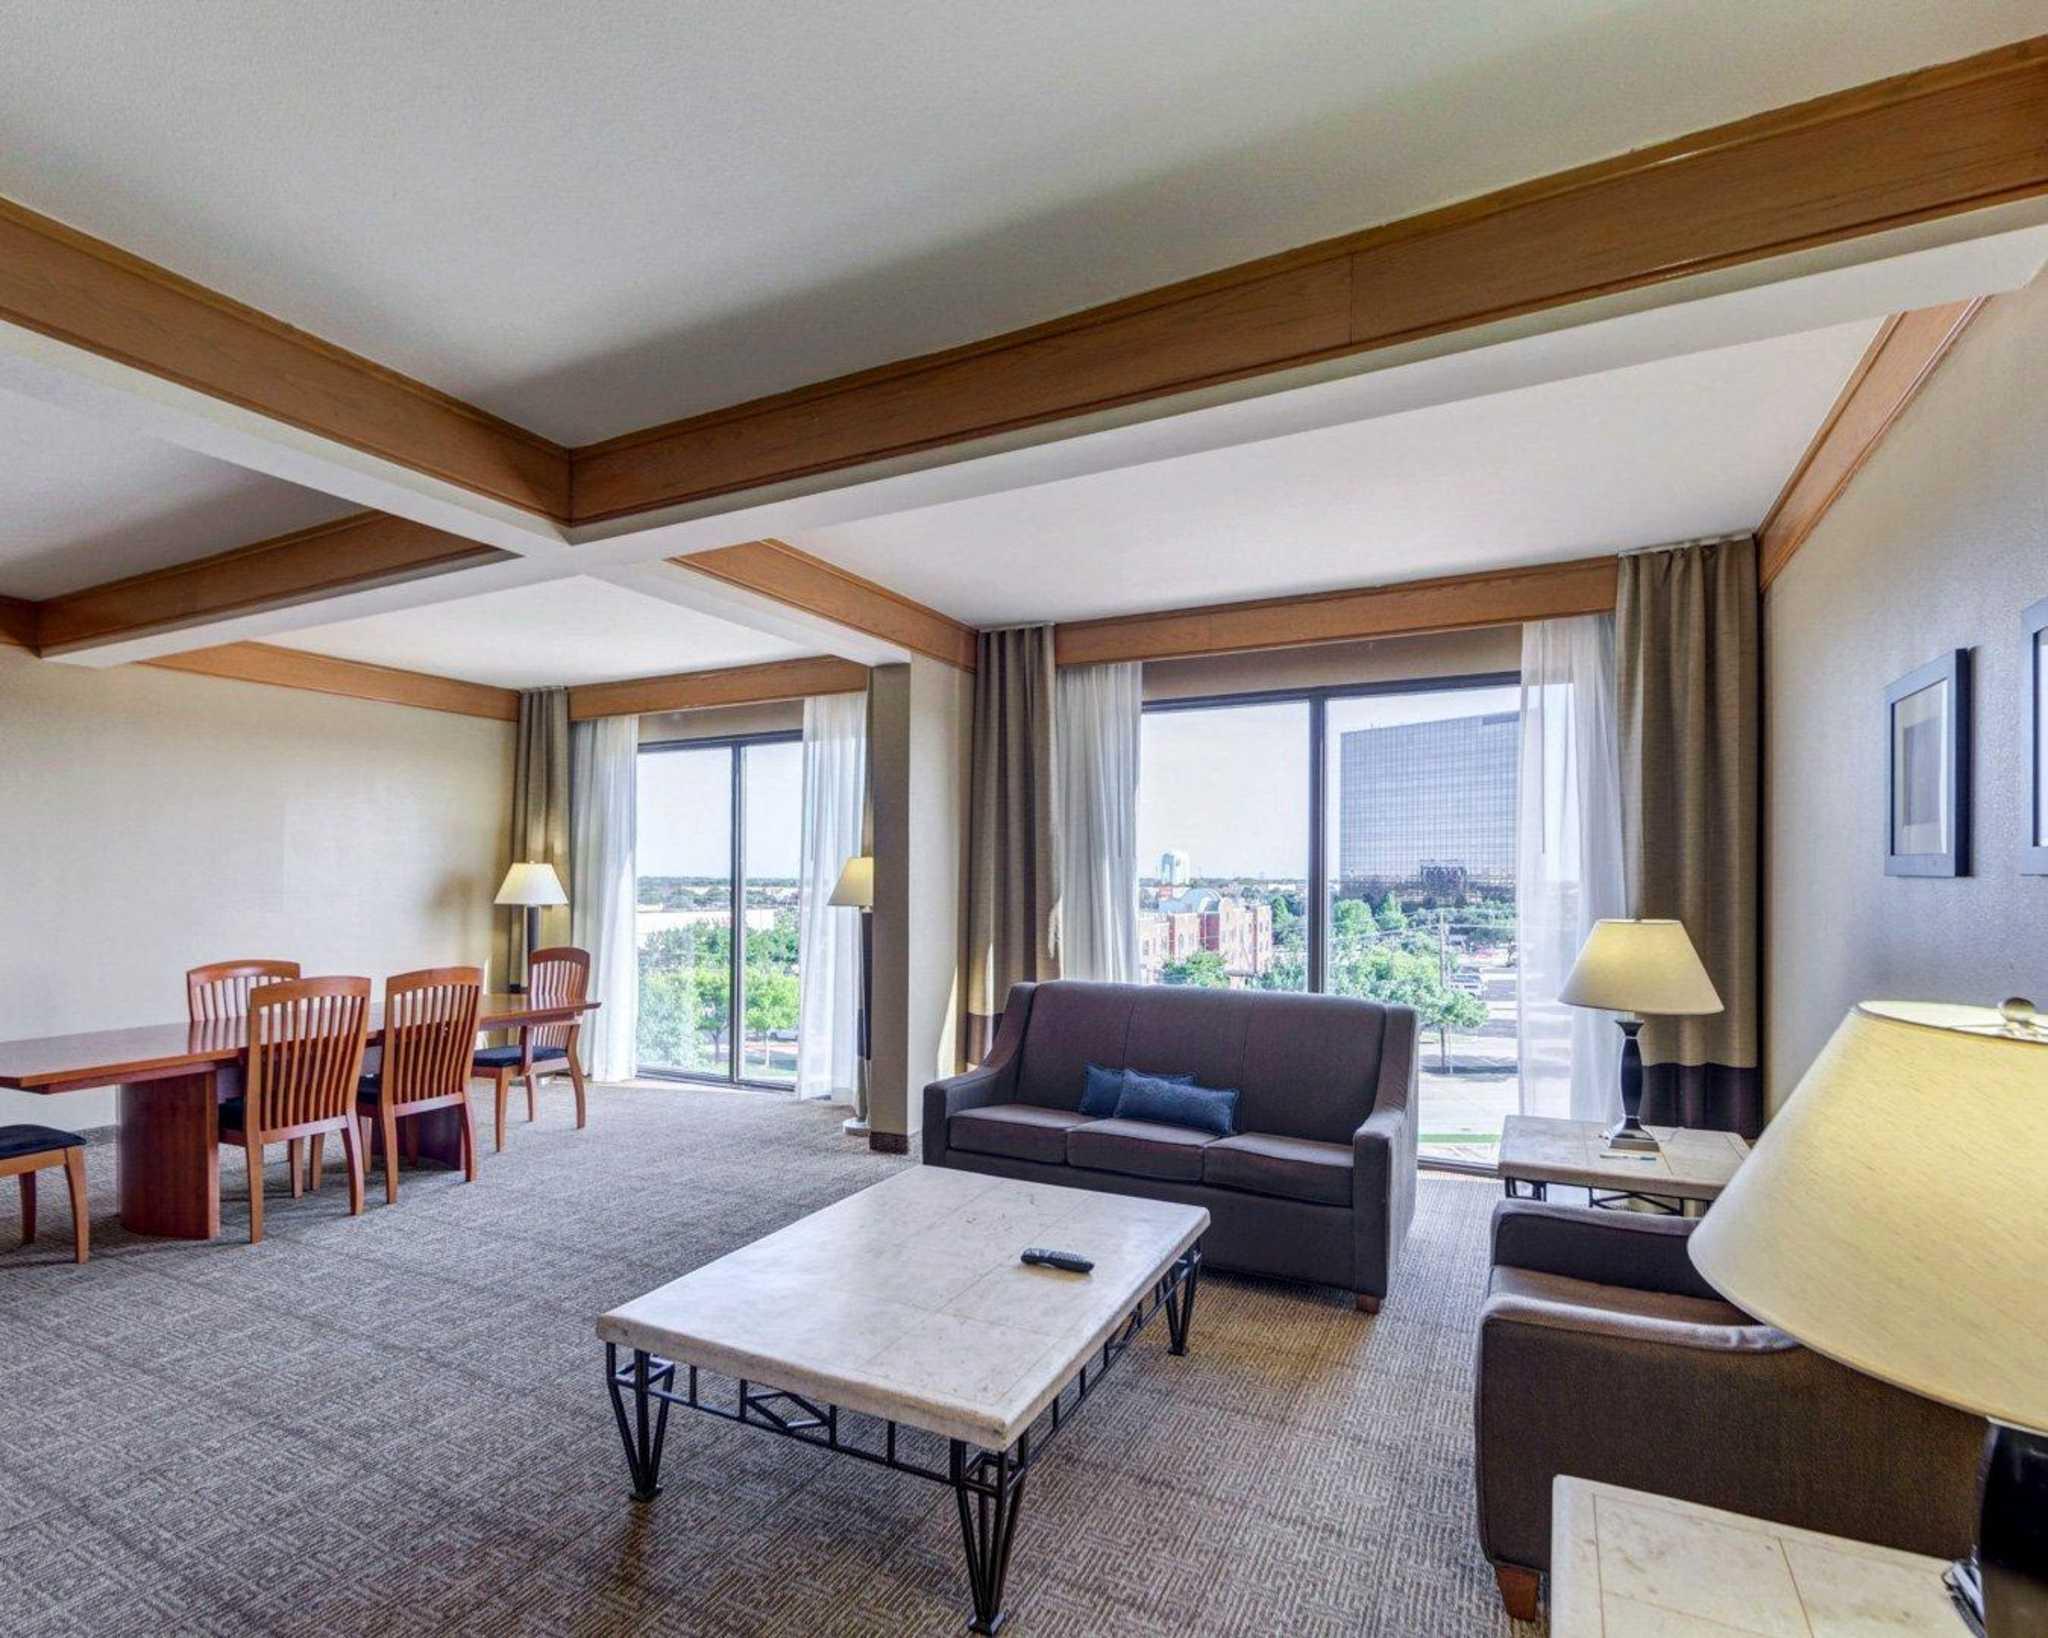 Comfort Inn & Suites Plano East image 50